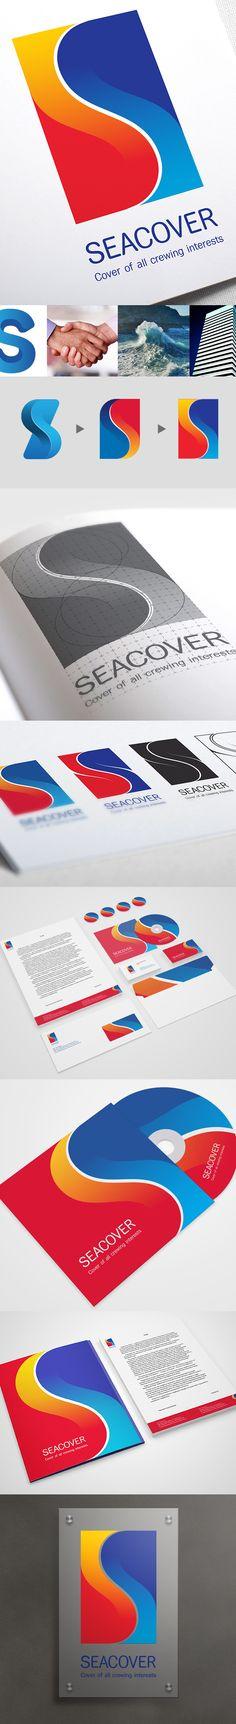 Seacover / Corporate identity by Andriy Bondar, via Behance